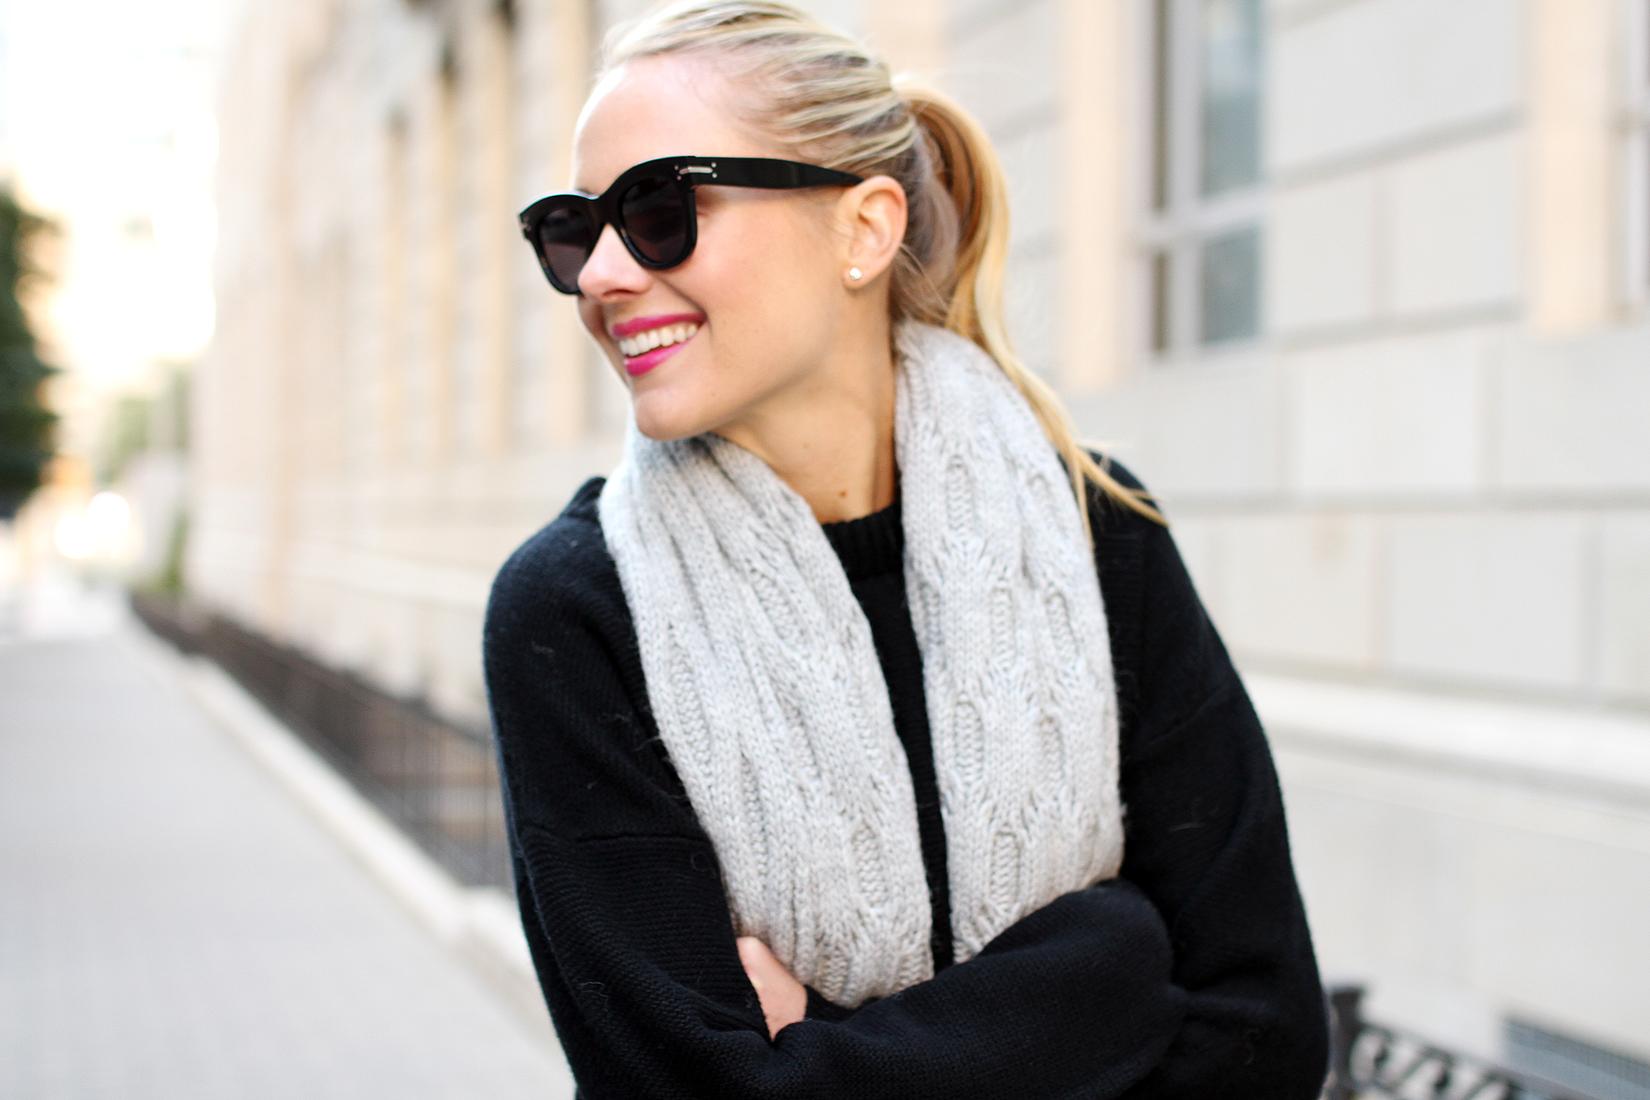 fashion-jackson-black-celine-sunglasses-banana-repubic-grey-fringe-scarf-black-sweater